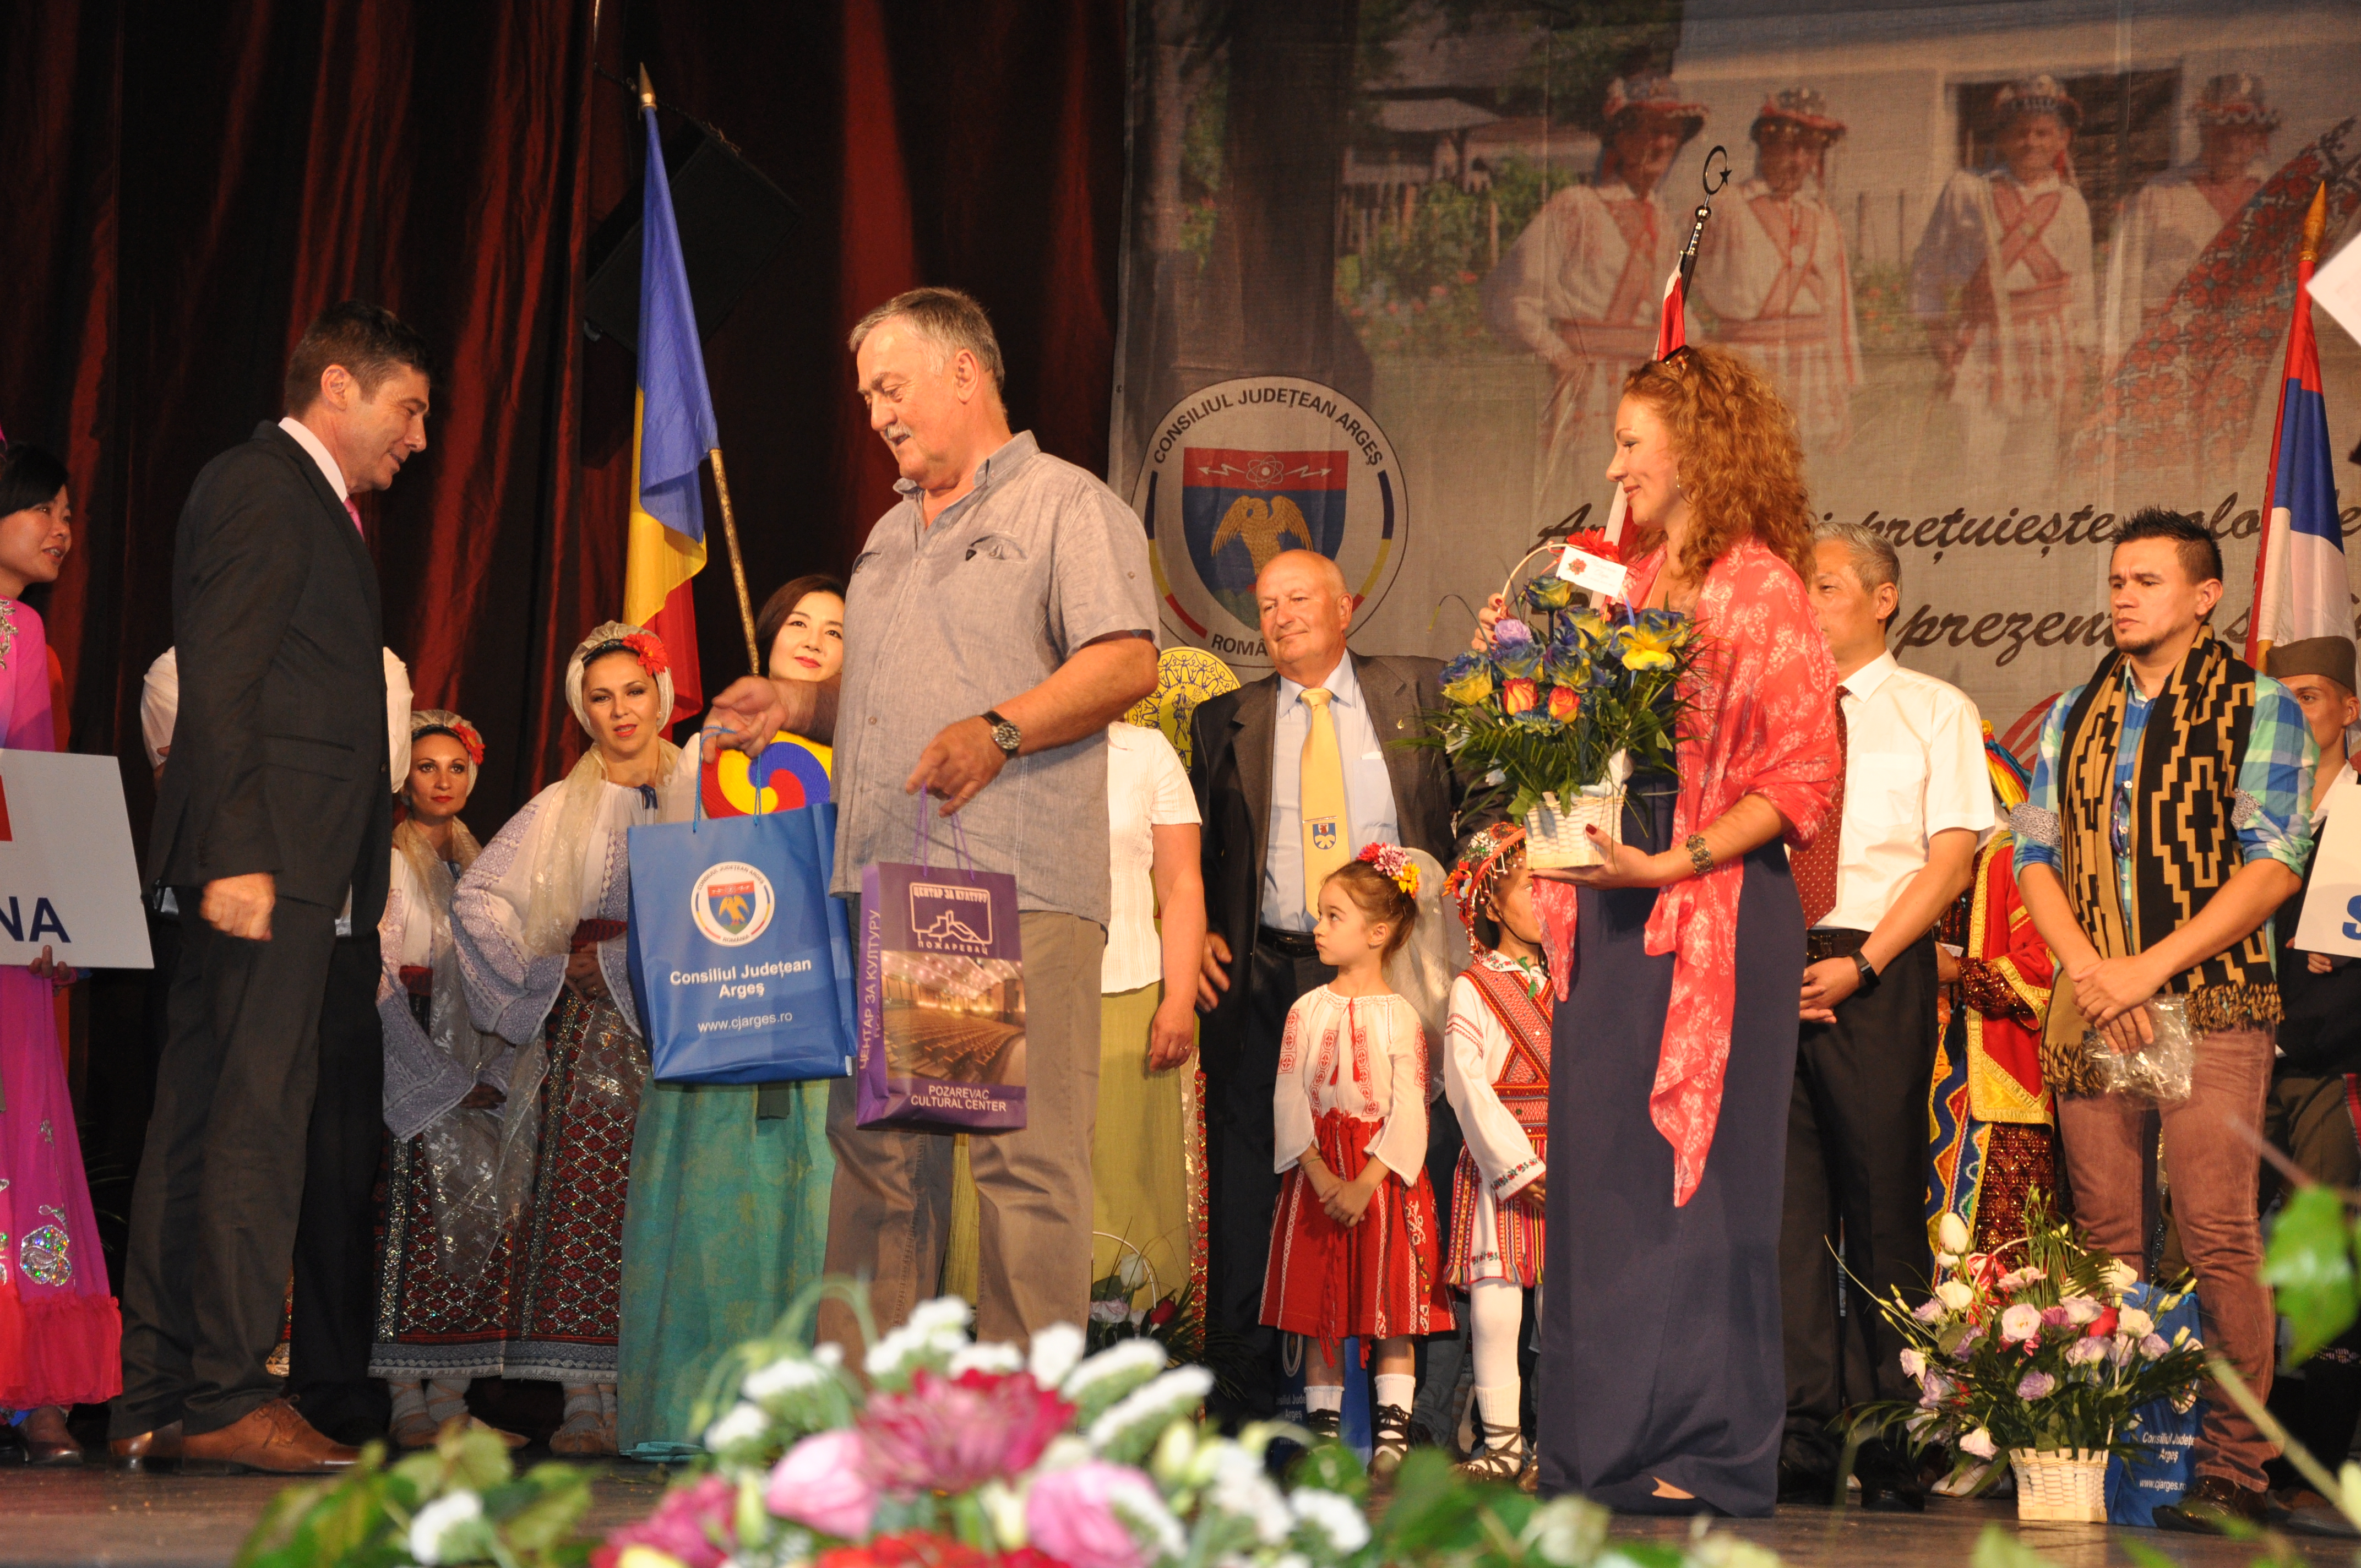 Festivalul International Carpati 2015 (11).JPG